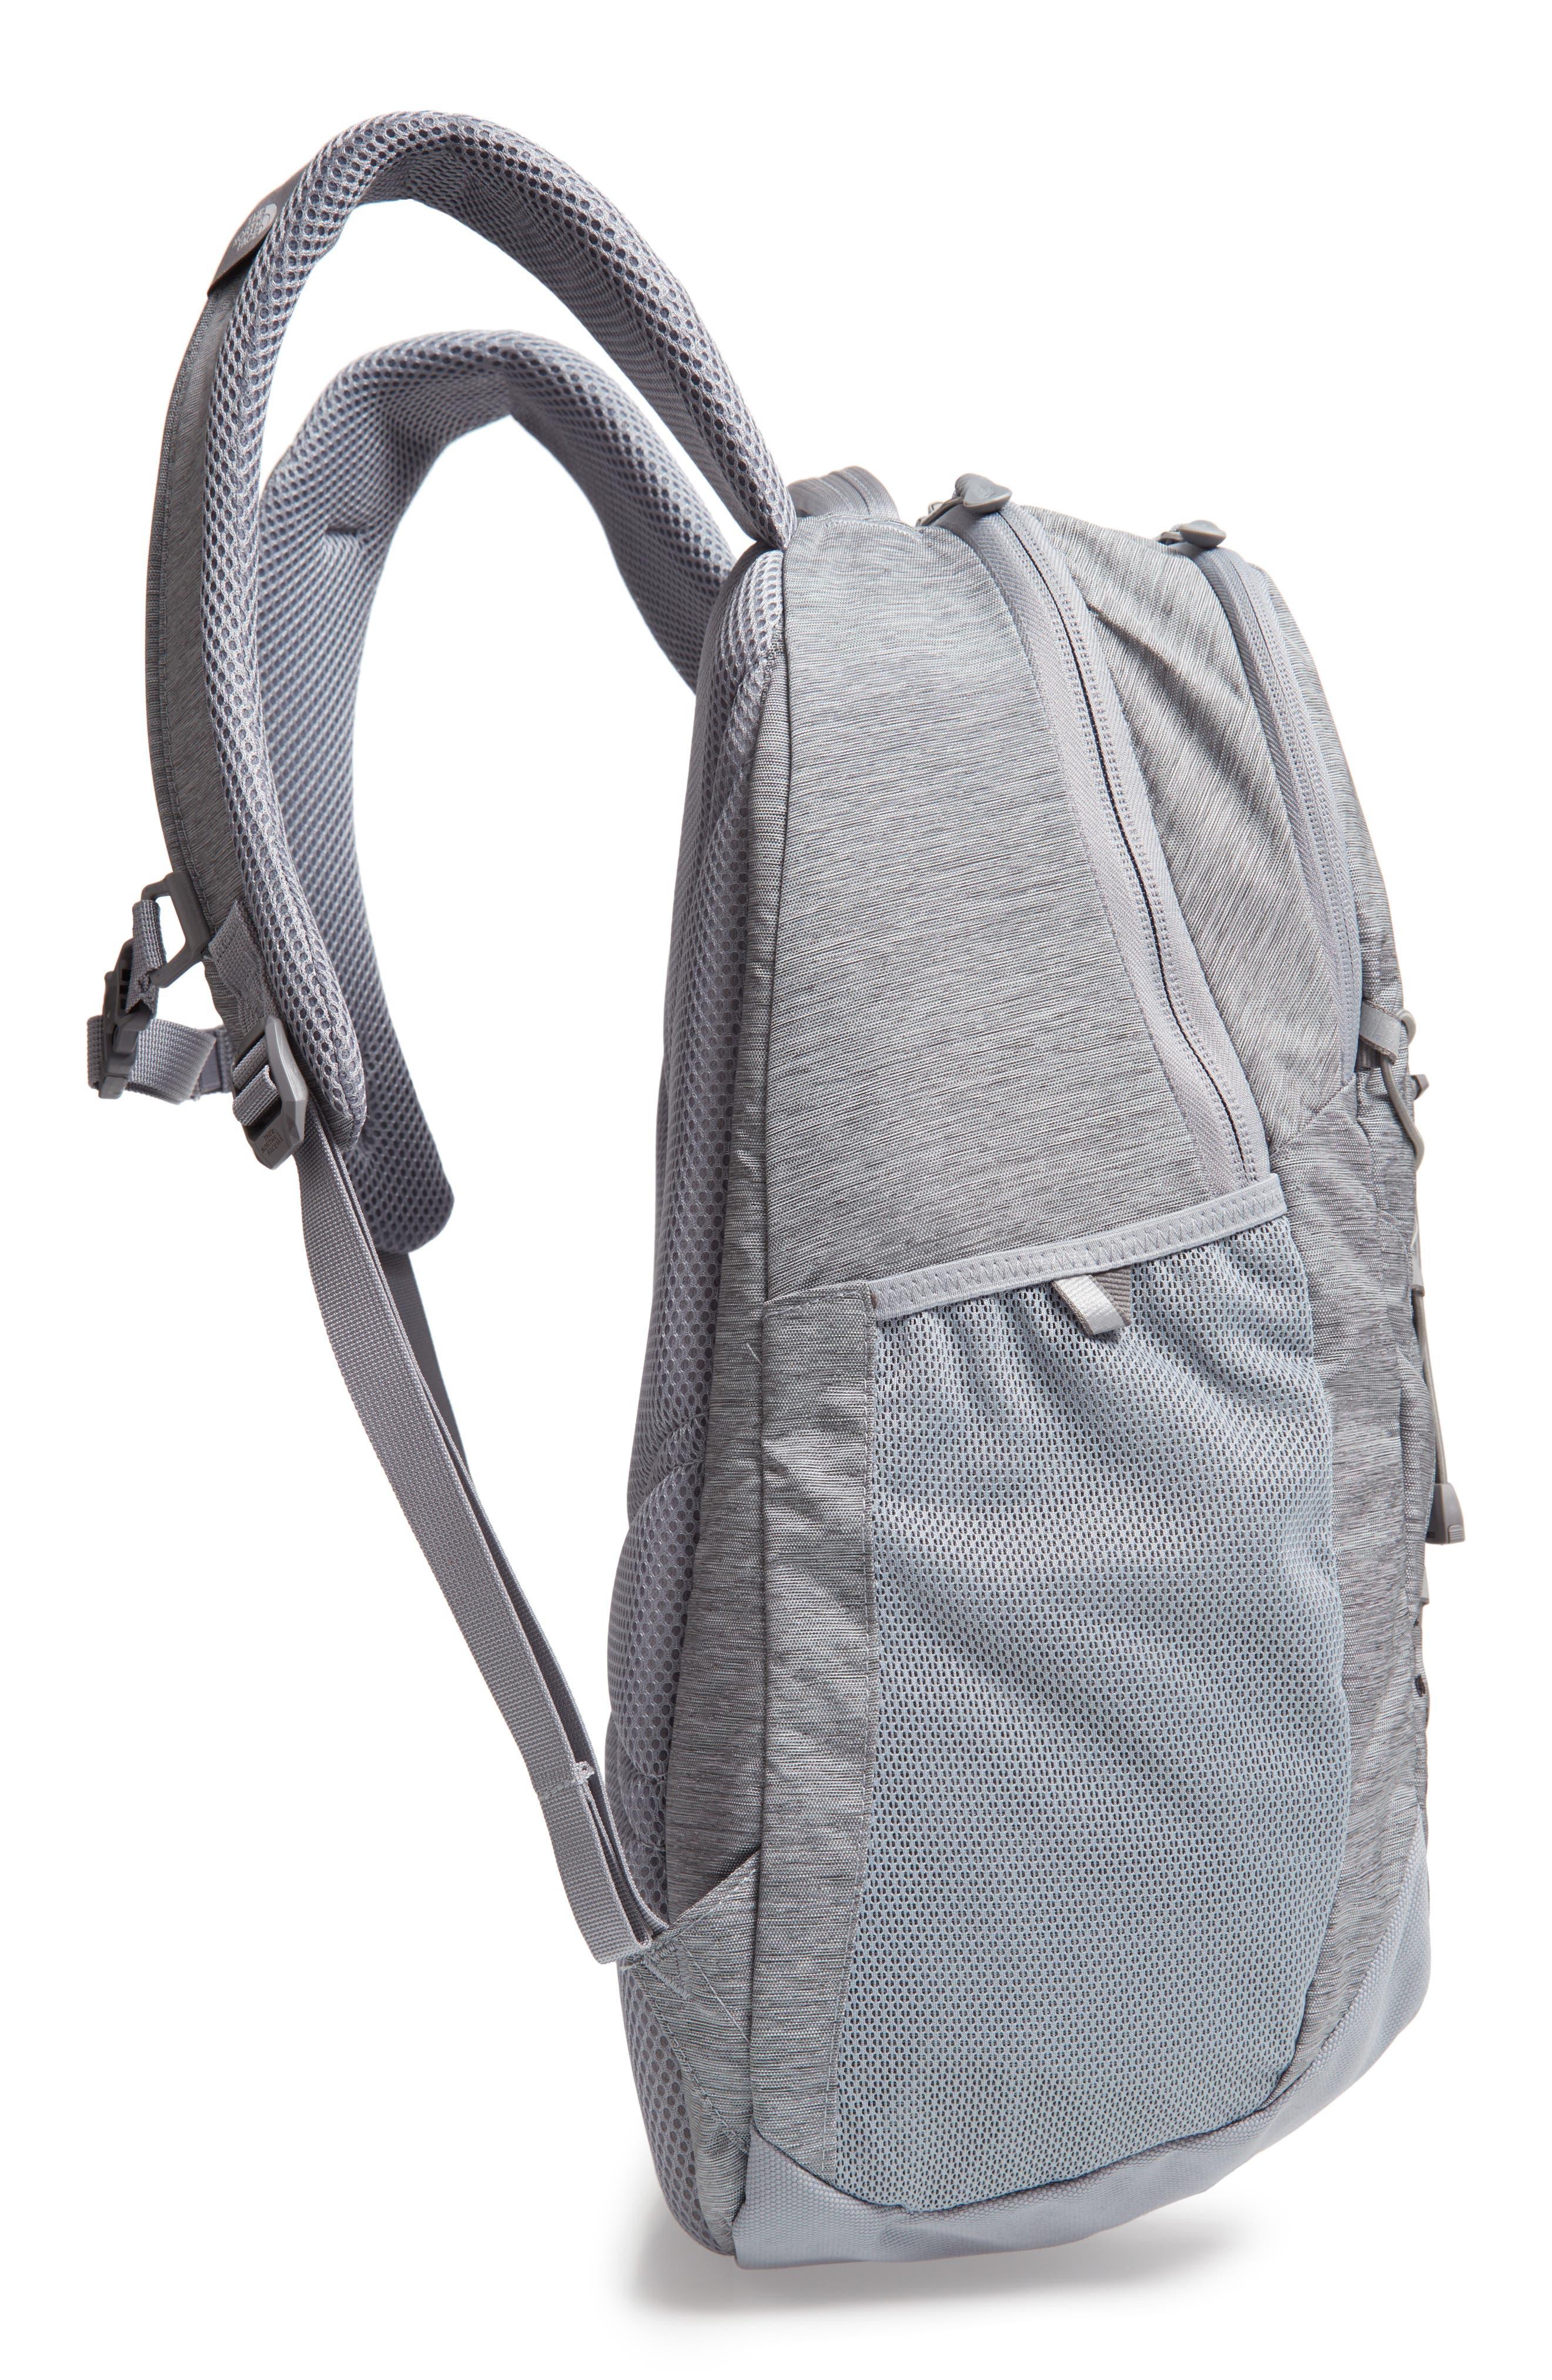 Jester Backpack,                             Alternate thumbnail 5, color,                             GREY DARK HEATHER/ TNF BLACK